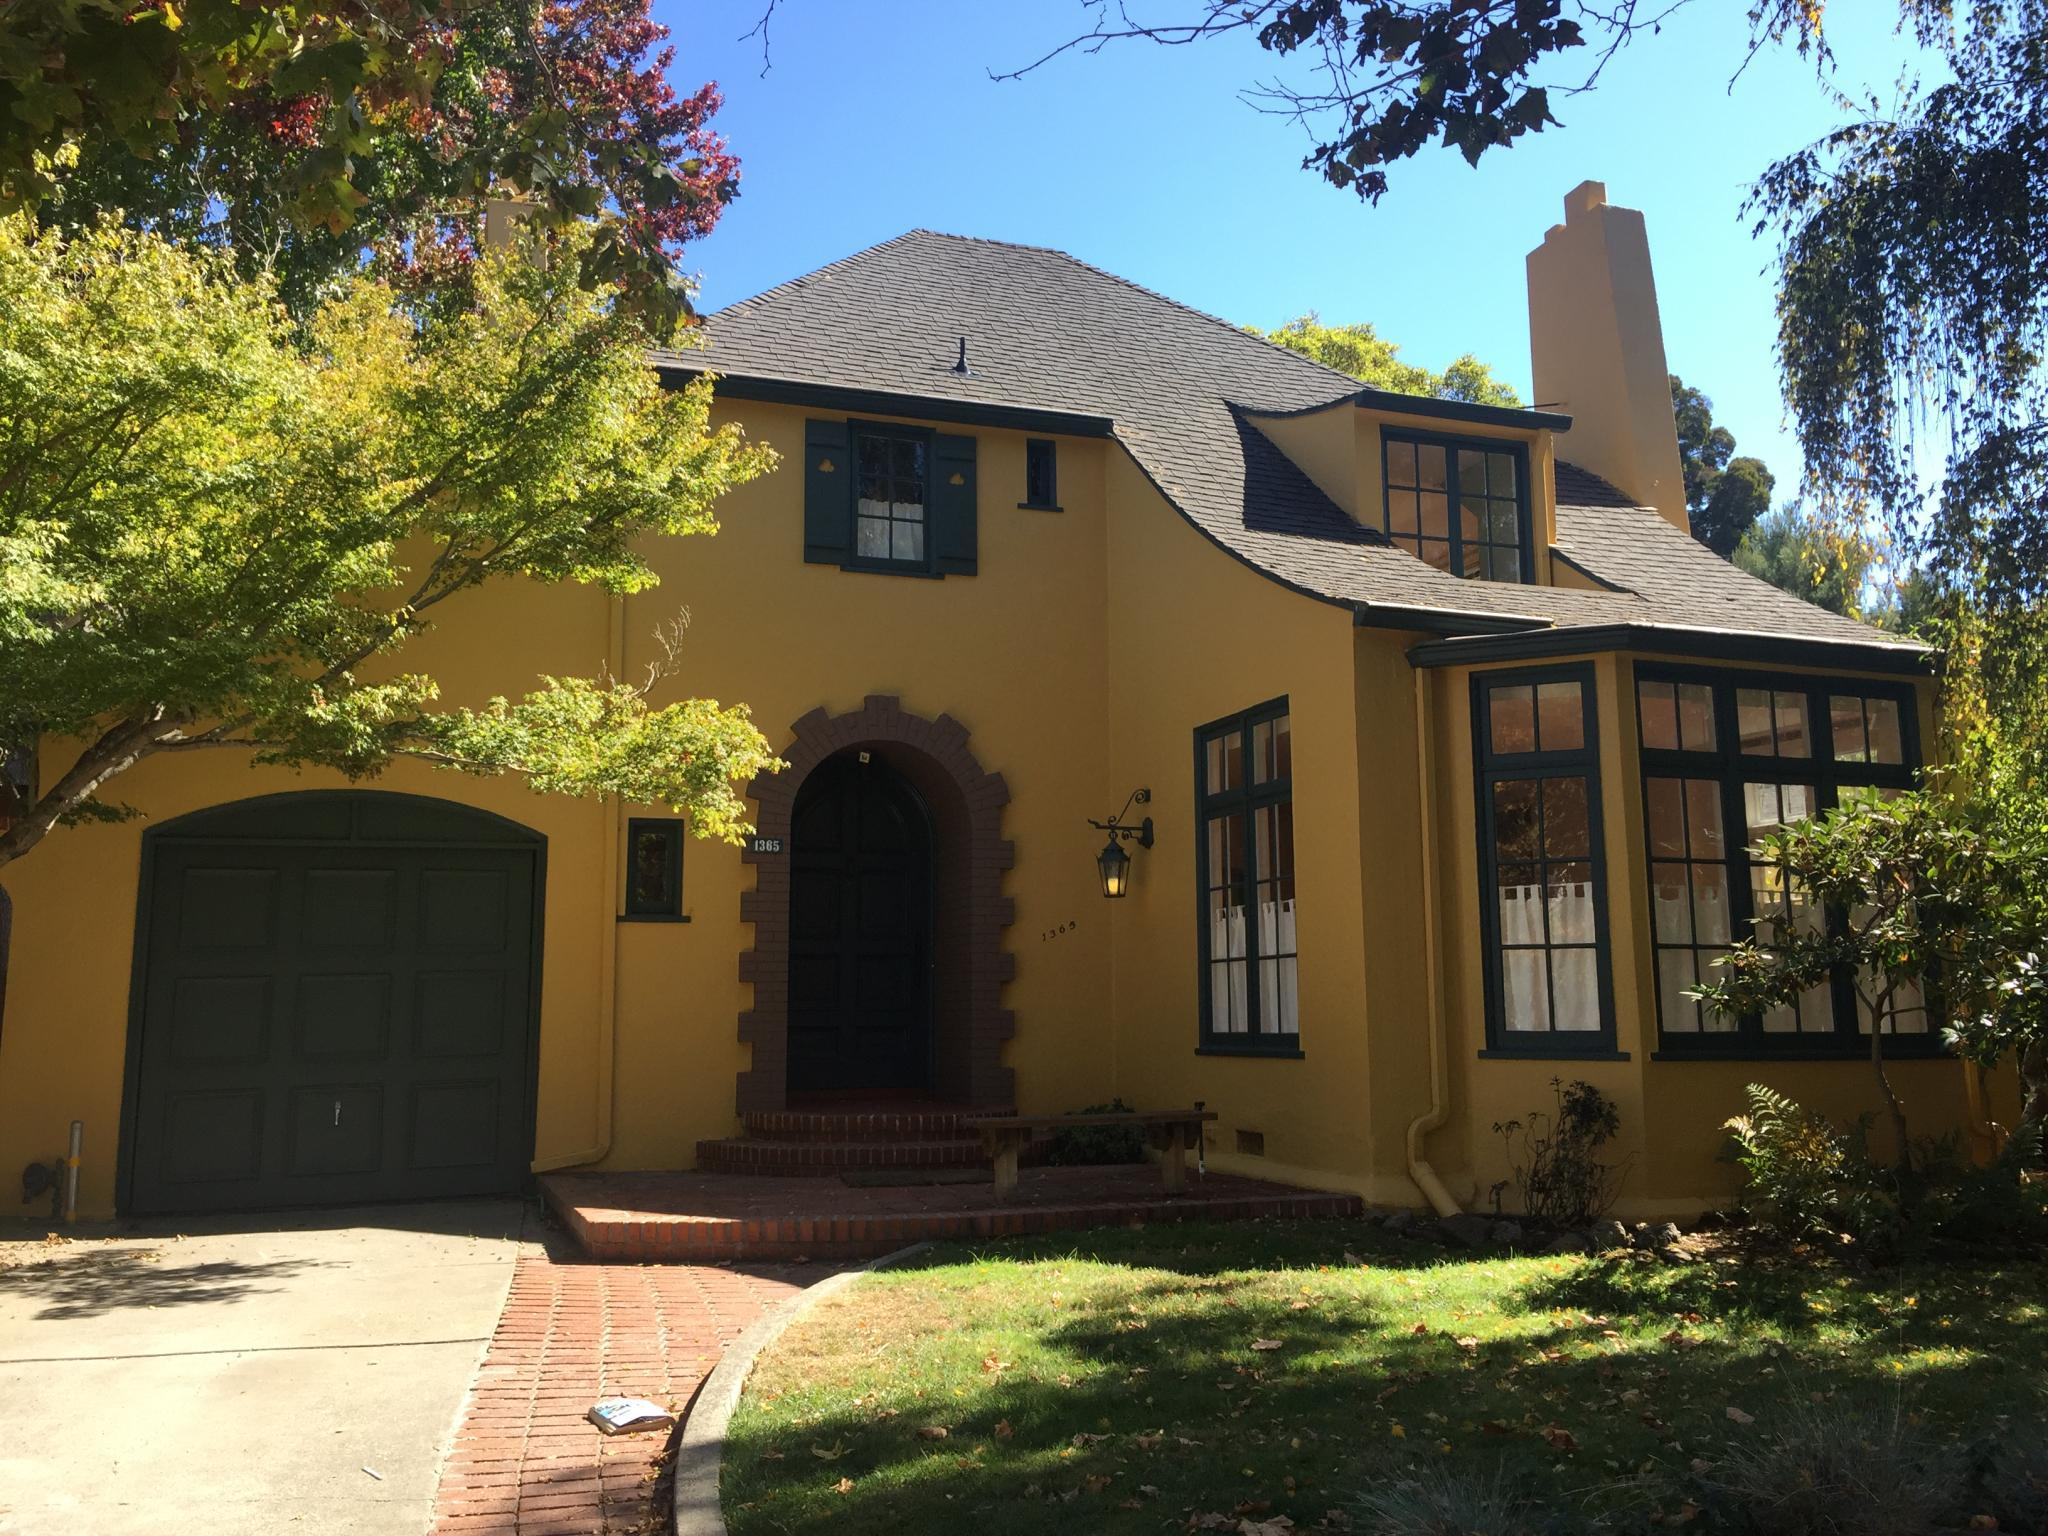 1365 Trestle Glen Rd, Oakland, CA 94610 For Rent | Trulia